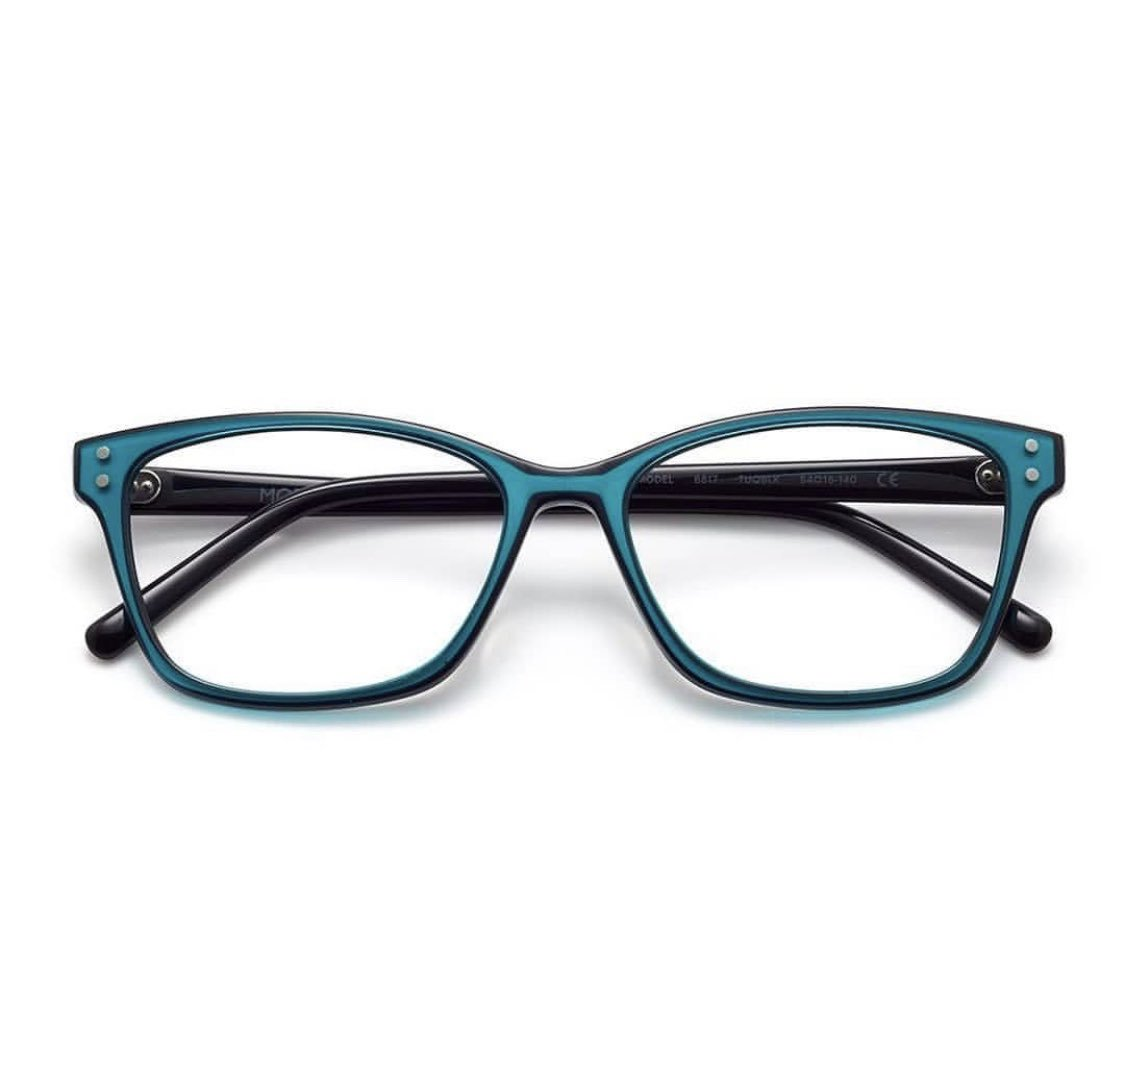 5621f565d18 The MODO Metal Core Acetete.  modoeyewear  fashion  lifestyle  luxury   eyewear  italian  design  branding  DigitalMarketing  metalcoreacetate ...